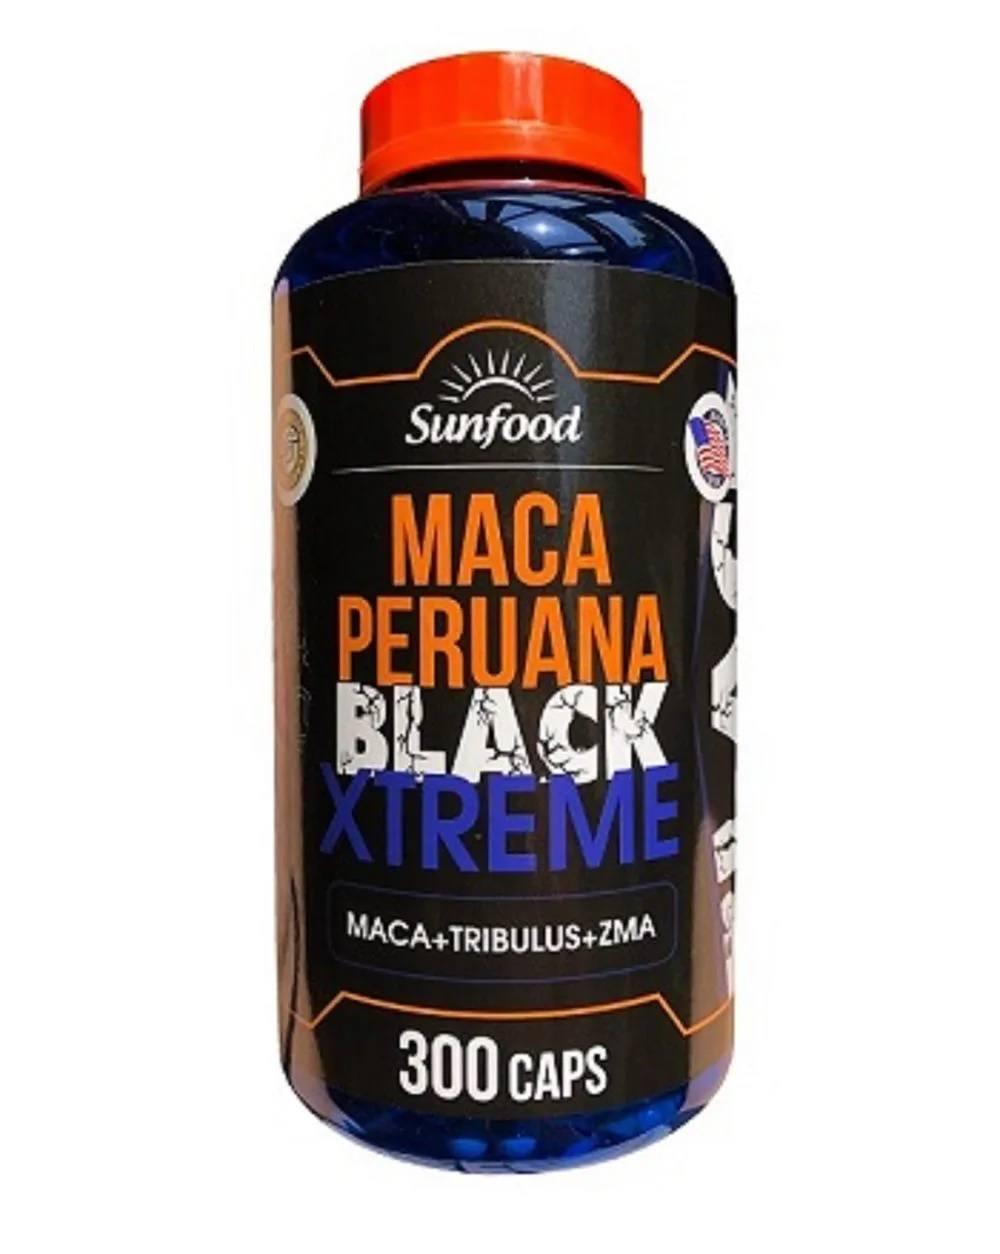 Maca Peruana Black Xtreme 300 cáps. -  SunFood